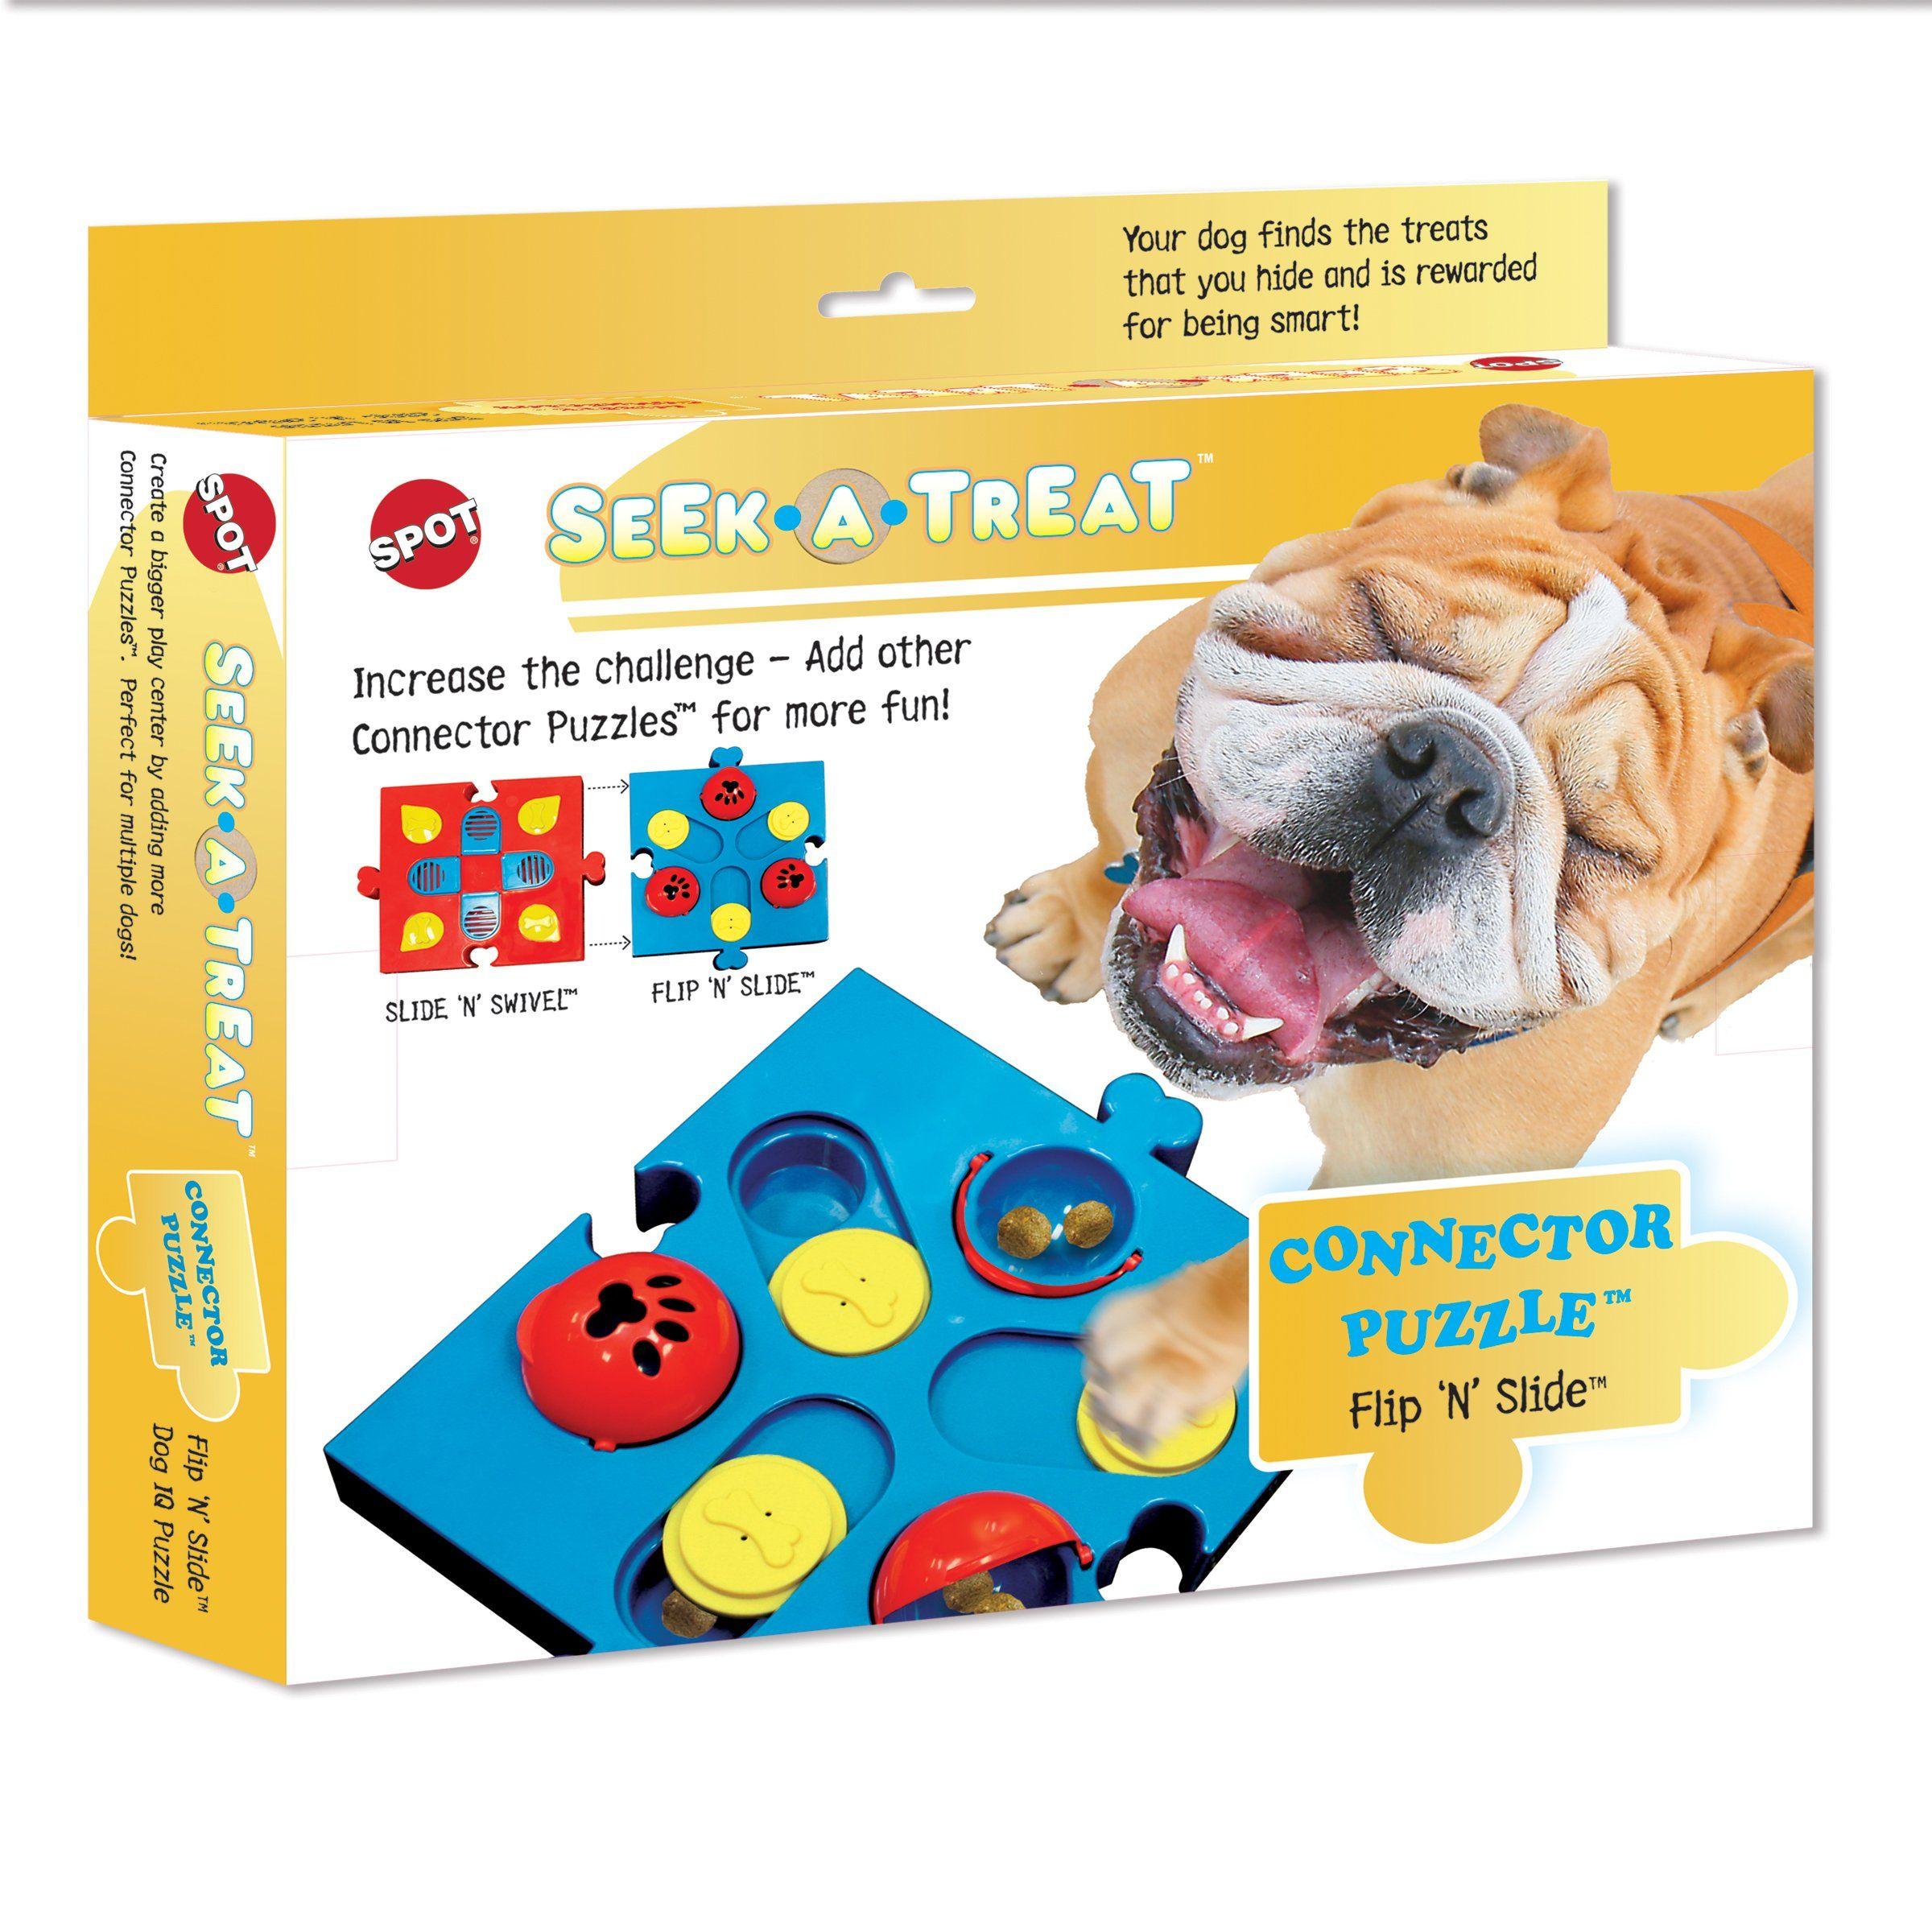 Ethical Pets Spot Seekatreat Flip N Slide Treat Dispenser For Dogs